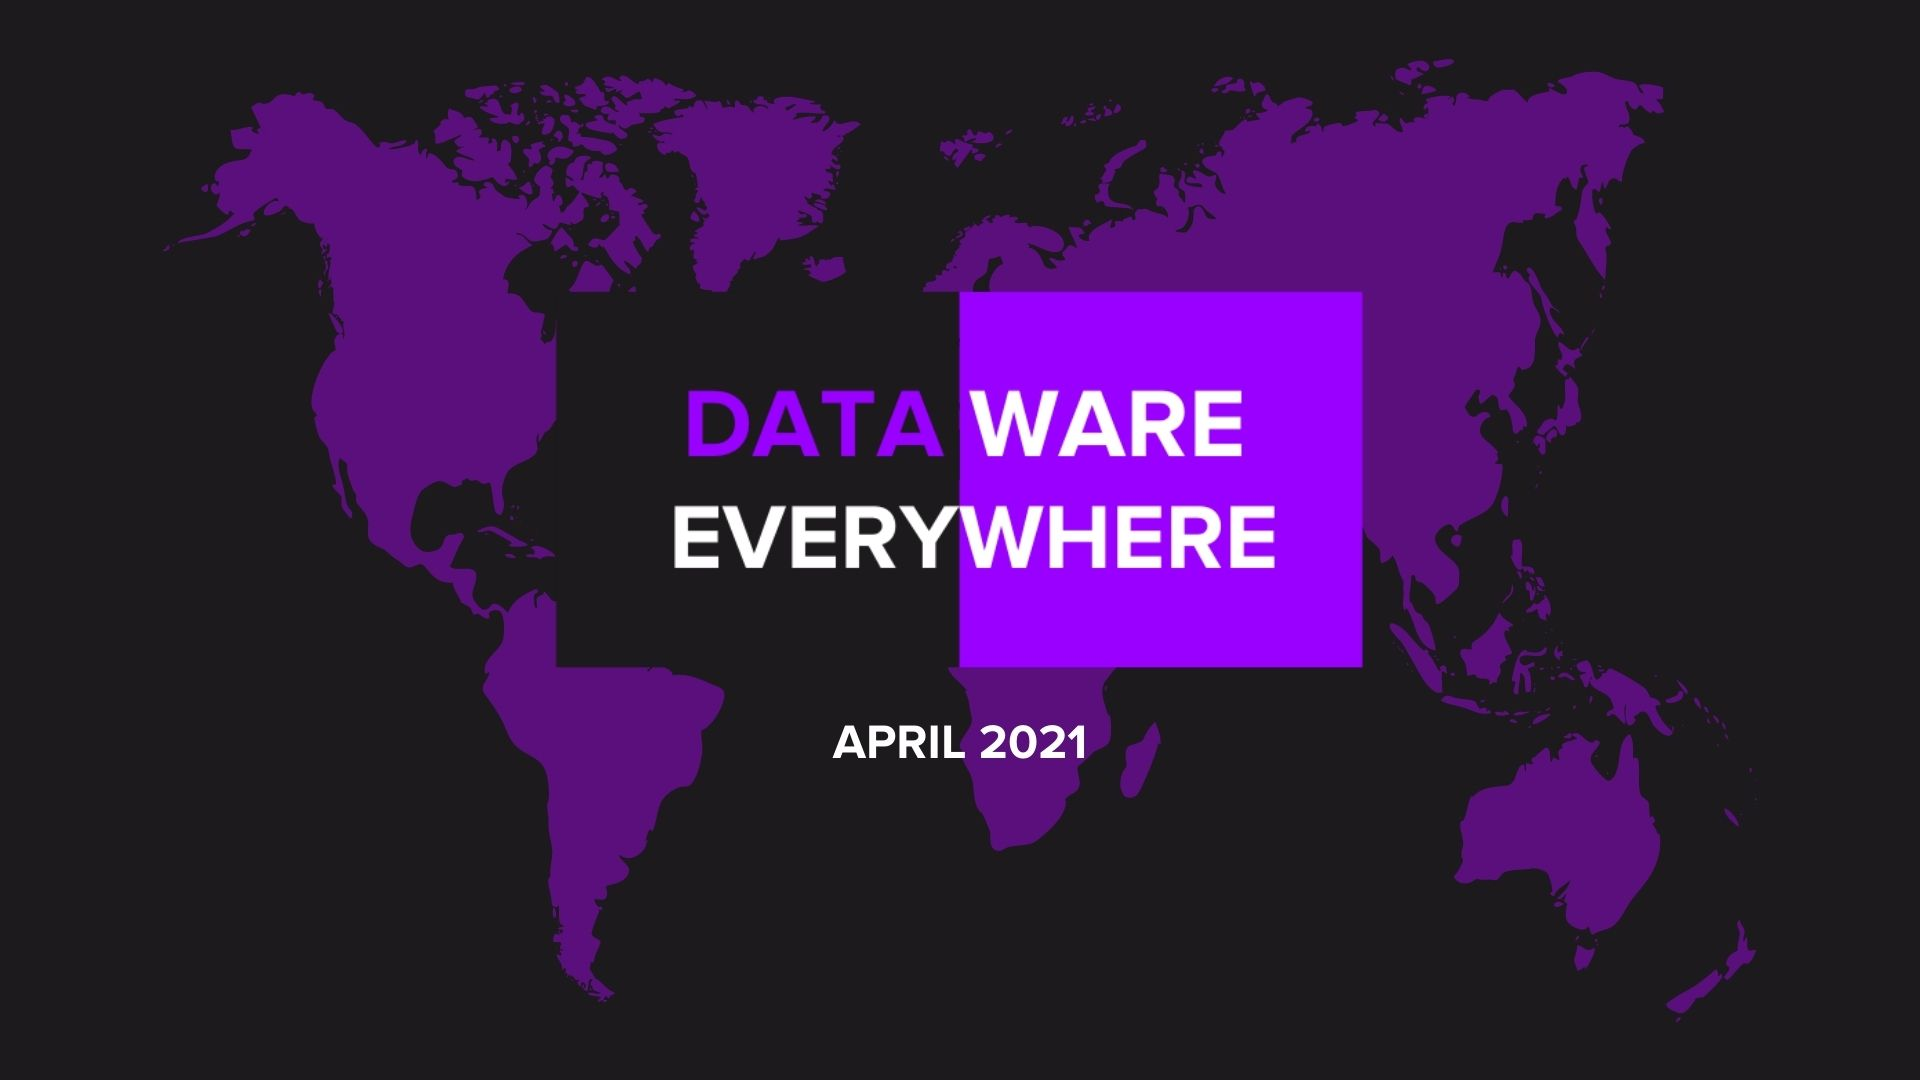 [Read] Dataware, Everywhere April 2021 Edition